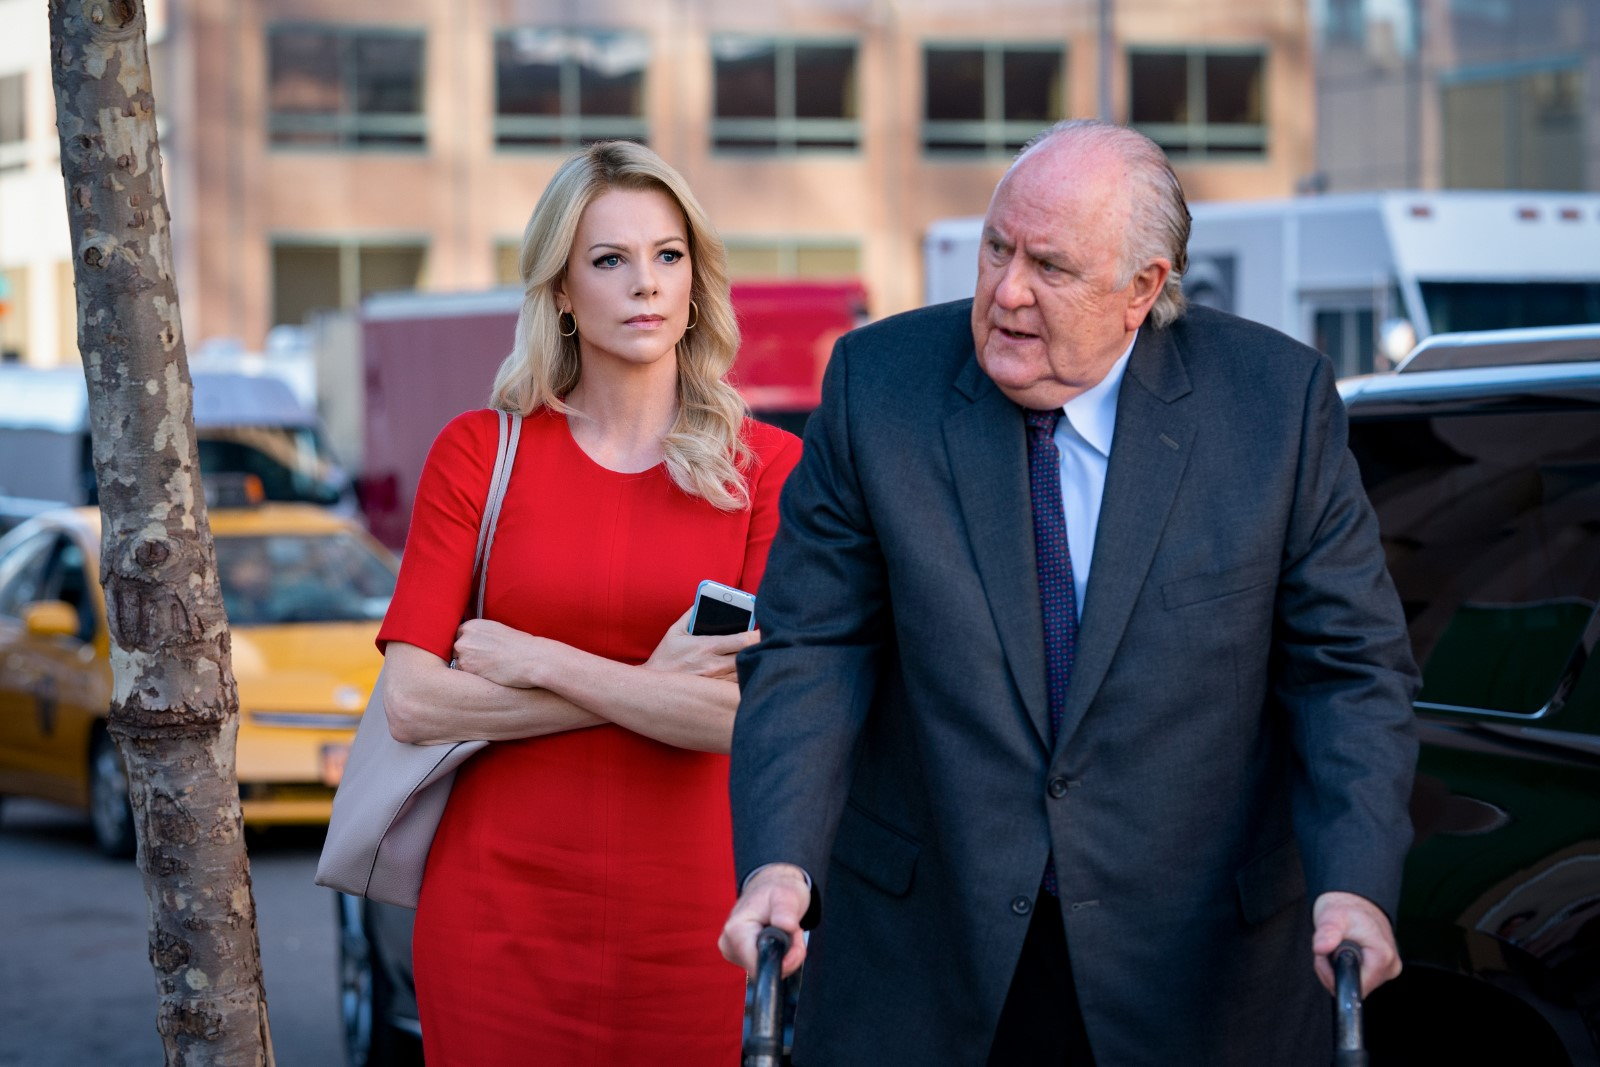 Charlize Theron y John Lithgow en El escándalo (Bombshell)